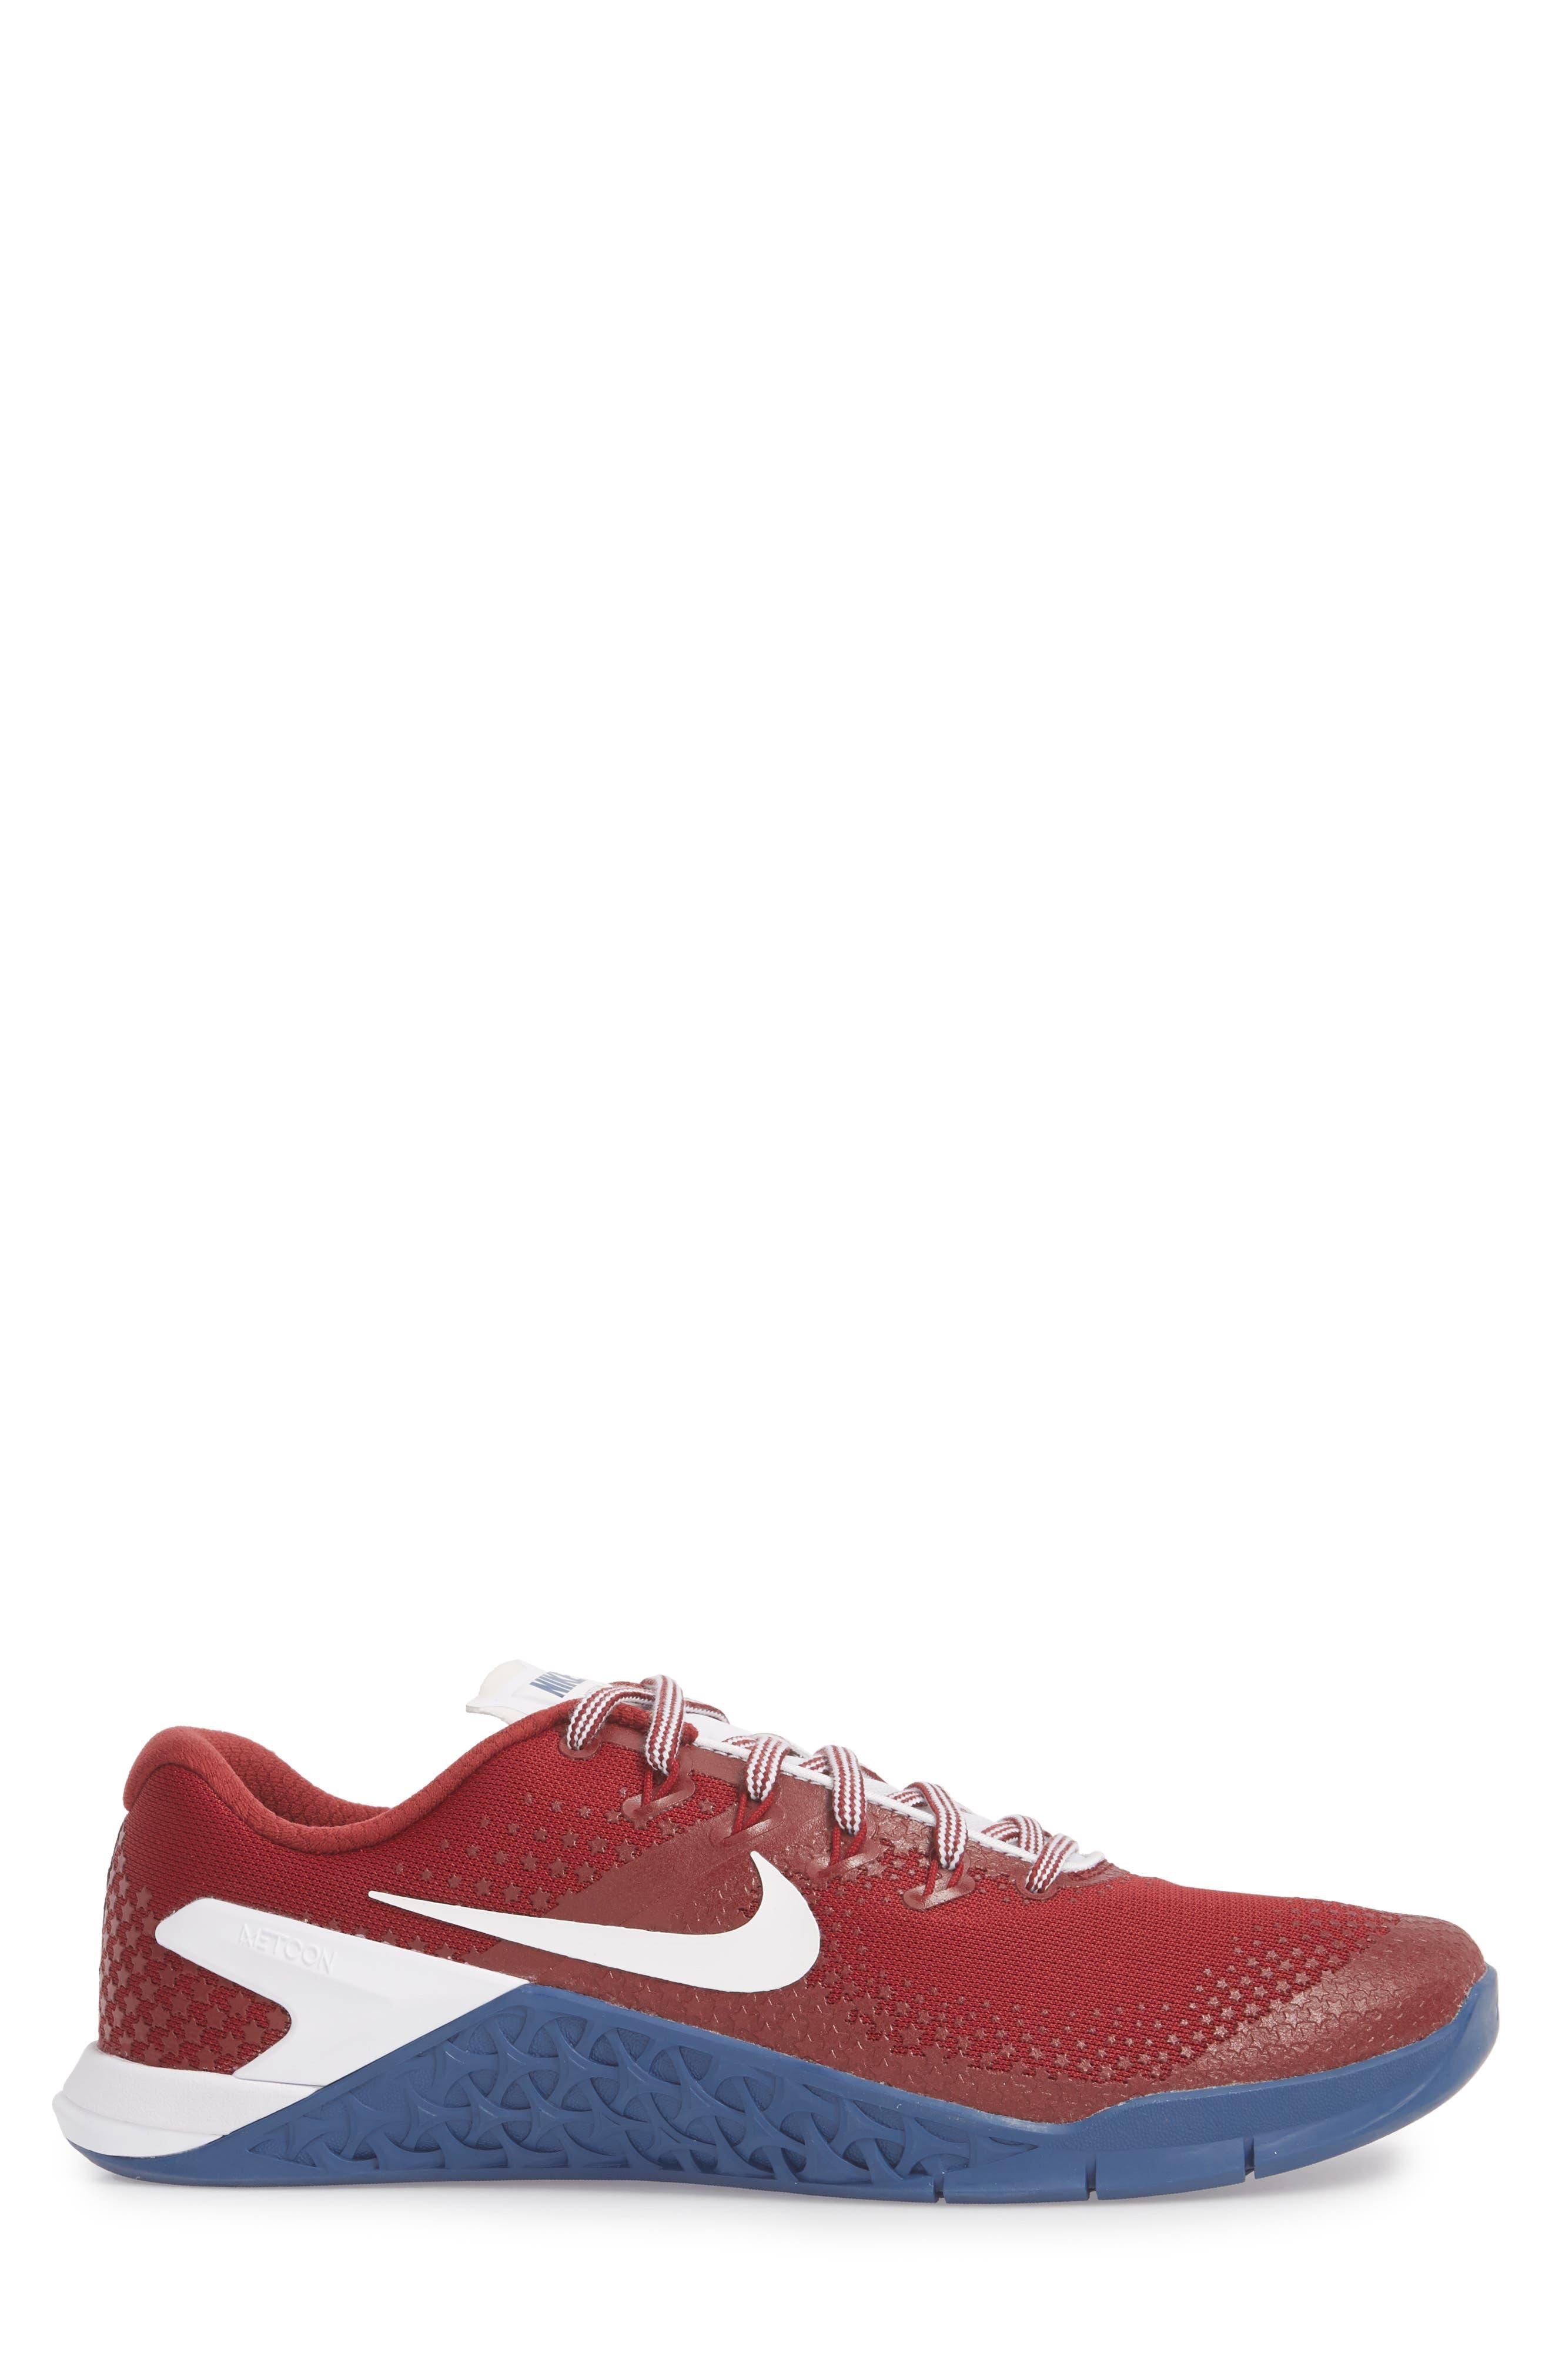 Metcon 4 Americana Training Shoe,                             Alternate thumbnail 3, color,                             Team Red/ White/ Gym Blue